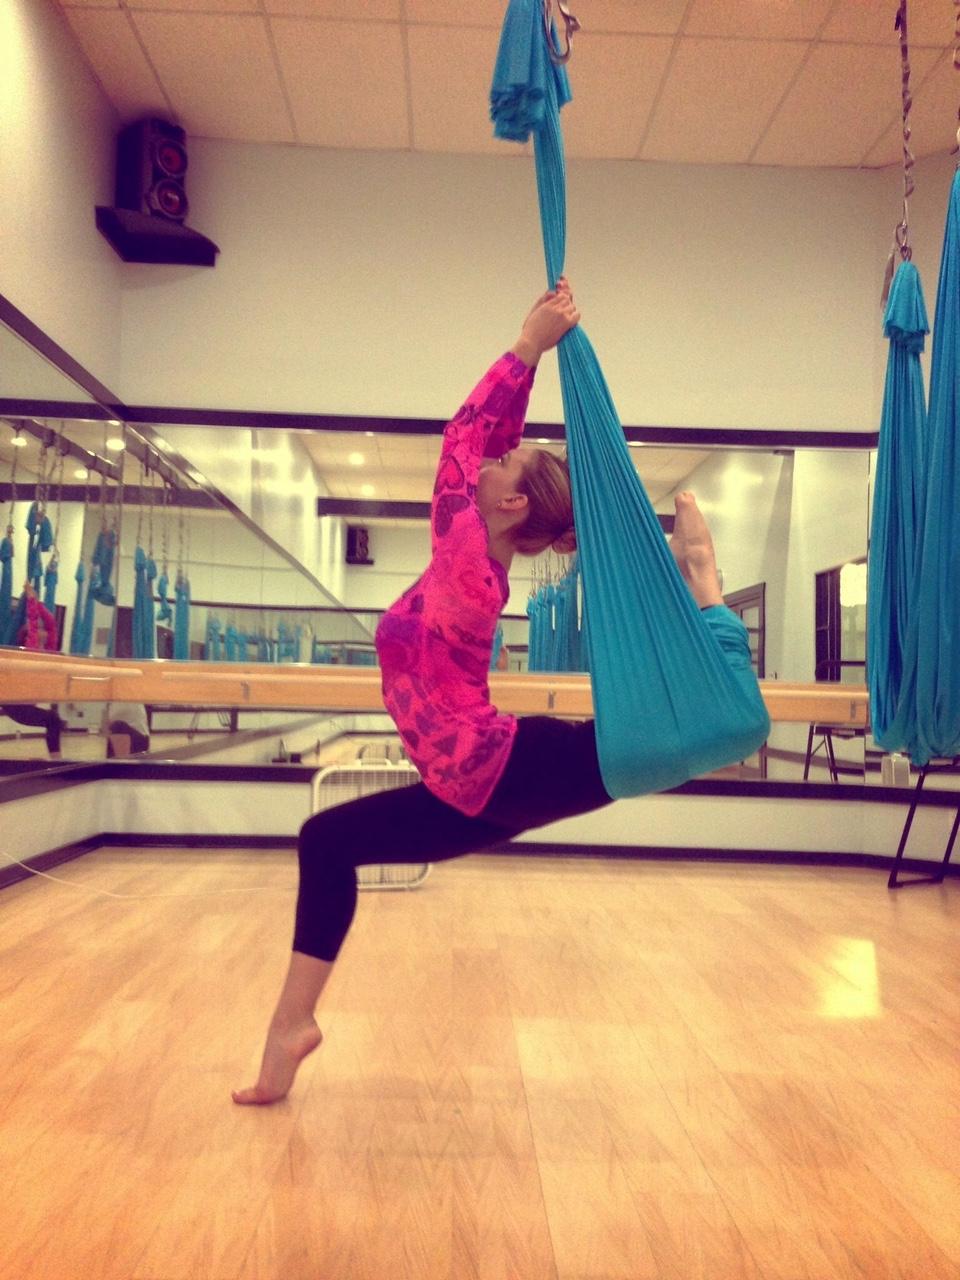 13 September 2013. Calabasas, CA. Anti-gravity fitness.